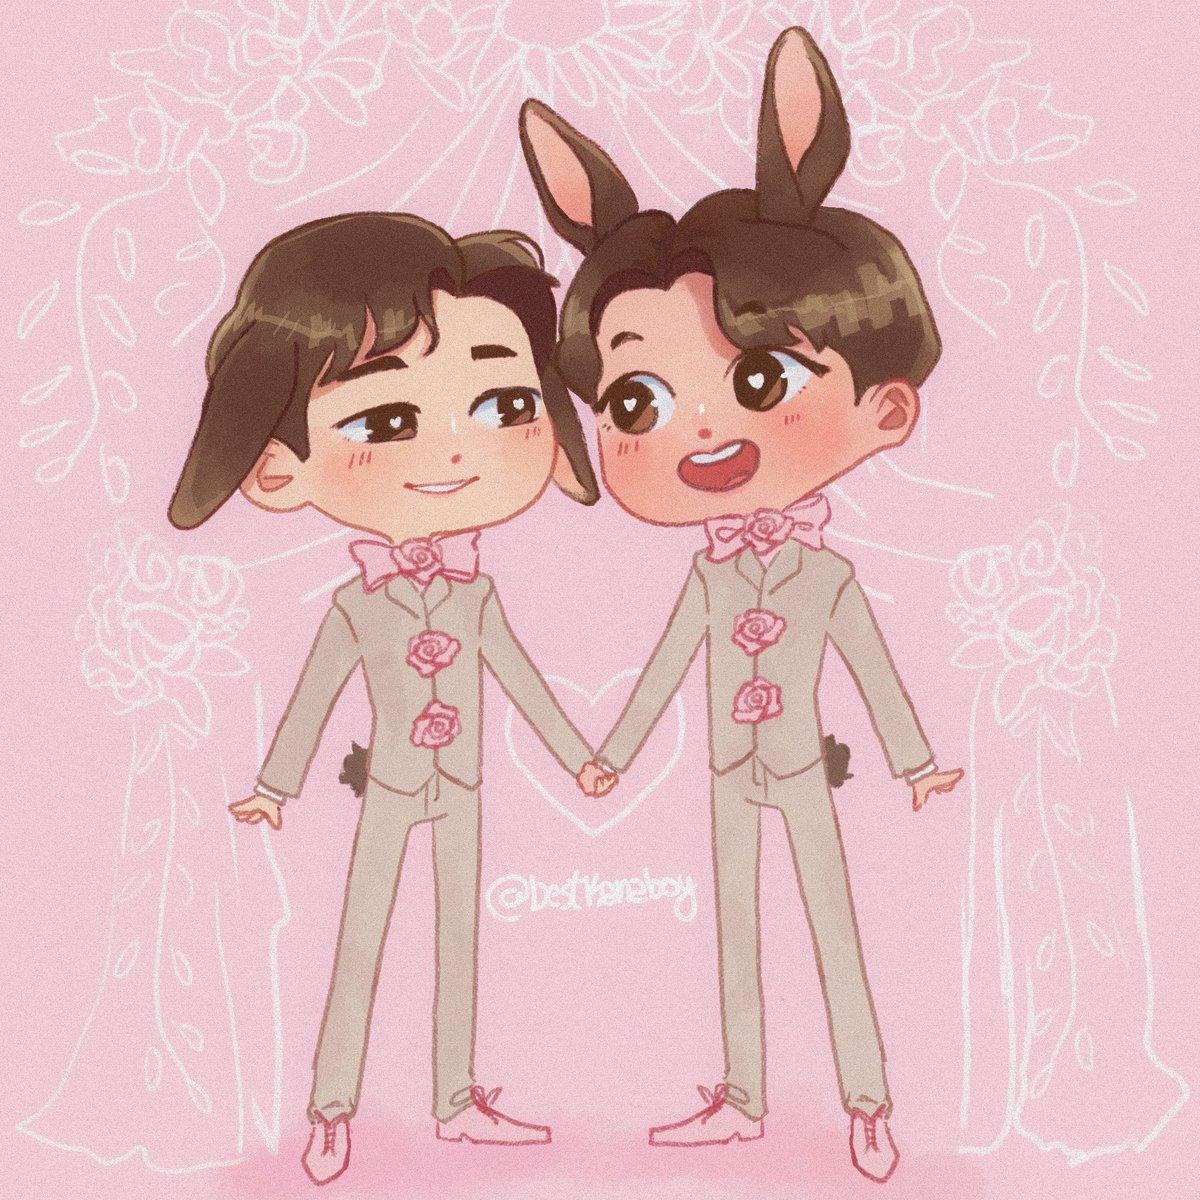 RT @bestkanaboy: bunny grooms~ 🐰 #WanjaiFanart #MewSuppasit #GulfKanawaut #mewgulf https://t.co/HqjTaKyJdI